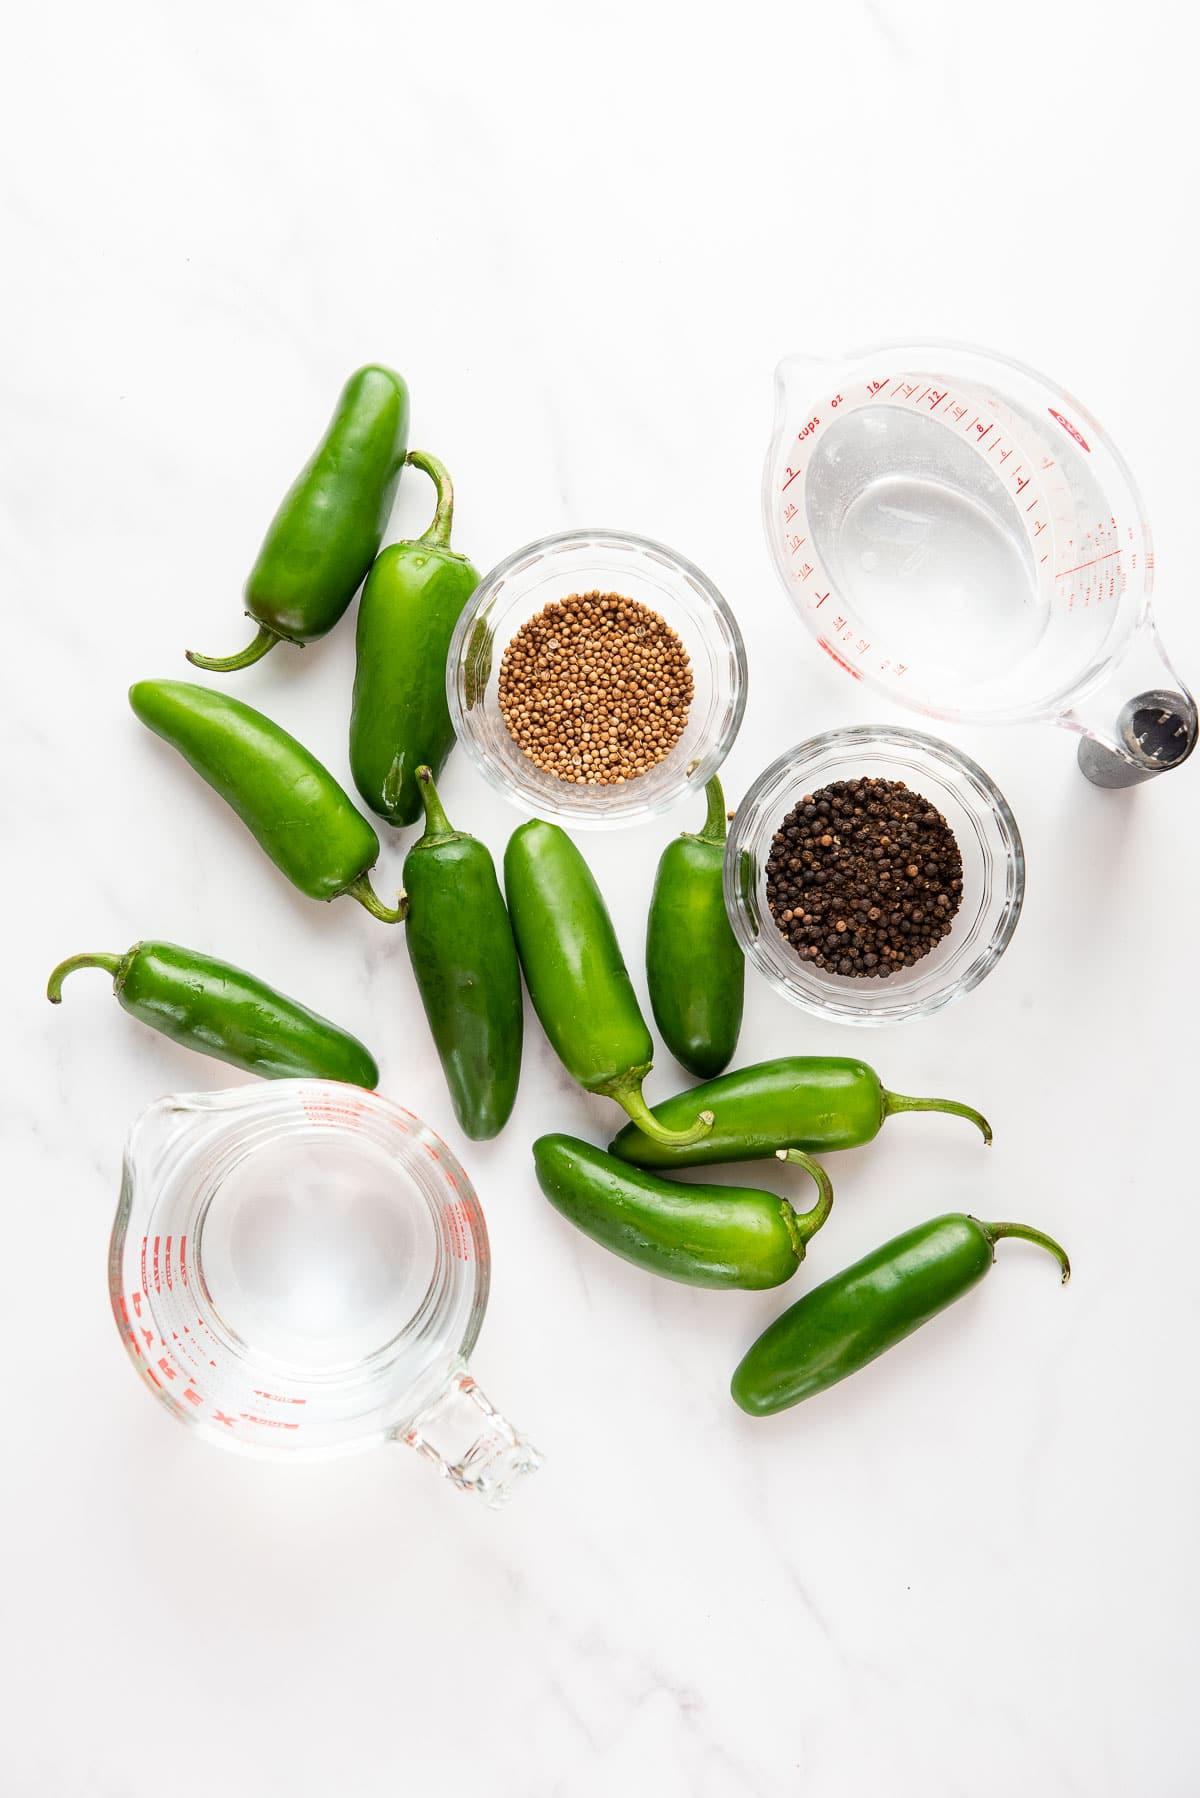 Pickled Jalapenos ingredients